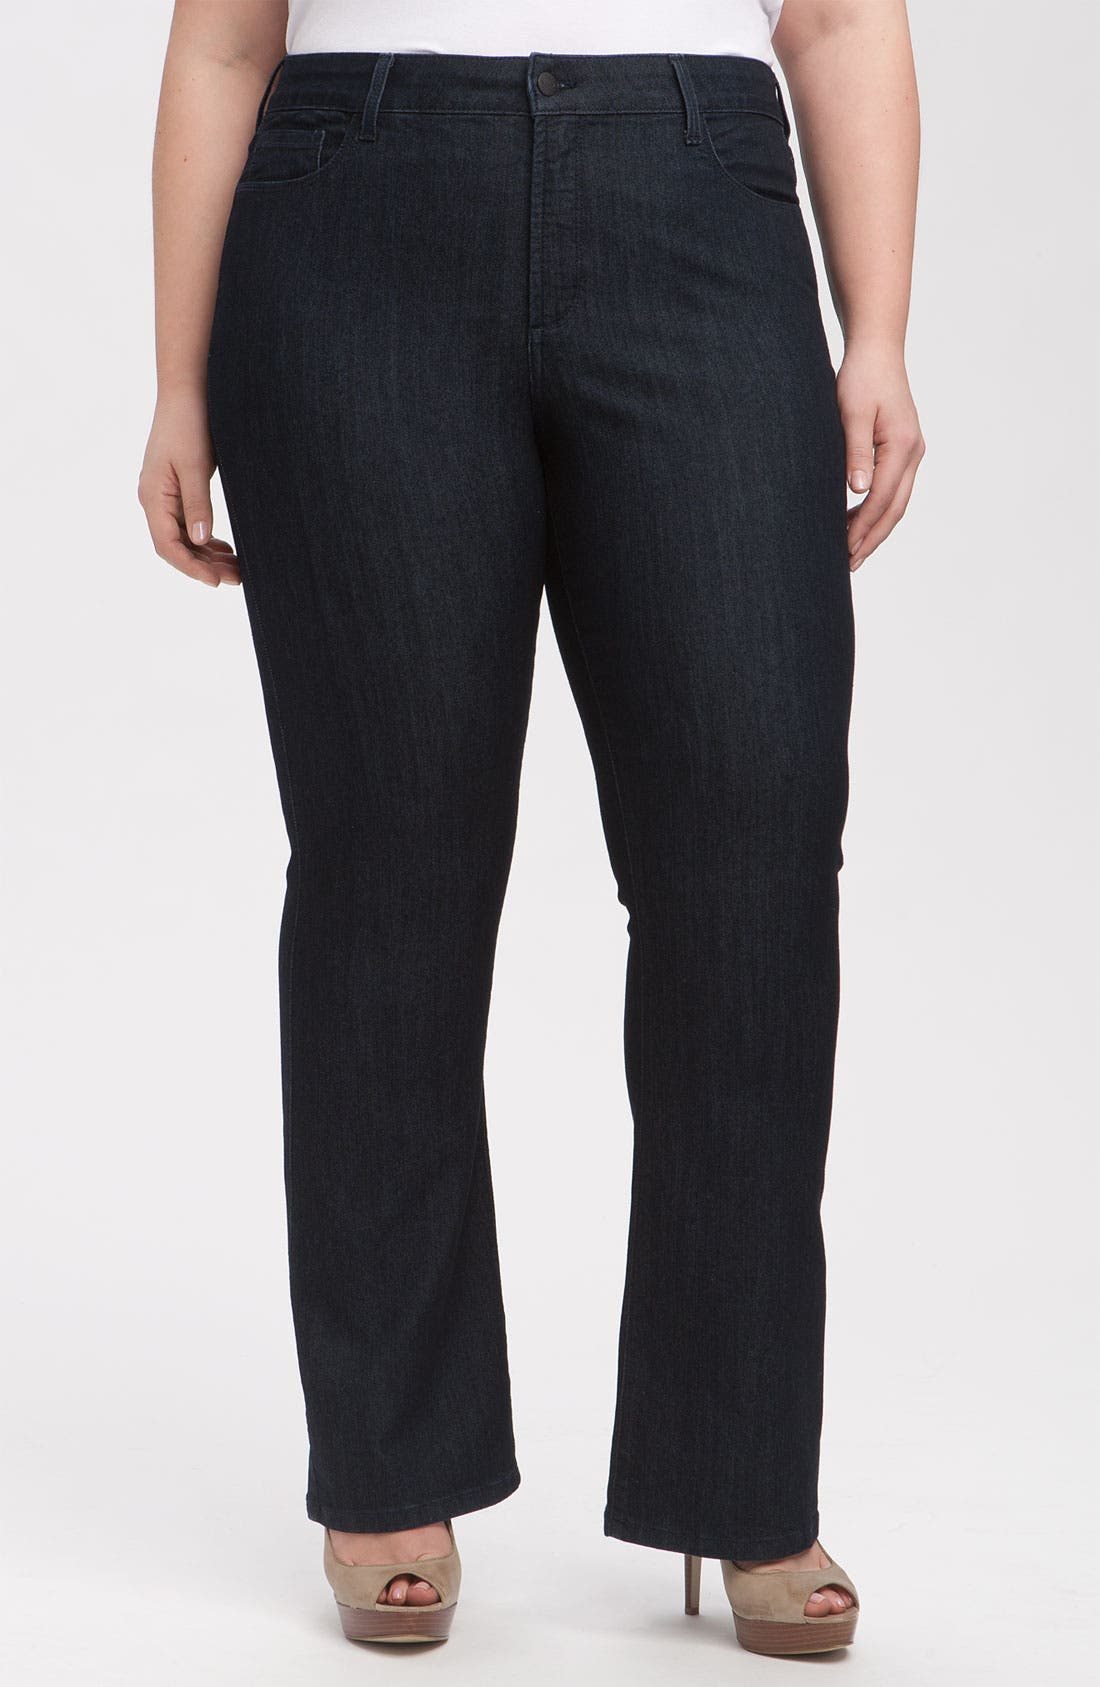 Main Image - NYDJ 'Barbara' Stretch Bootcut Jeans (Dark Enzyme) (Plus Size)